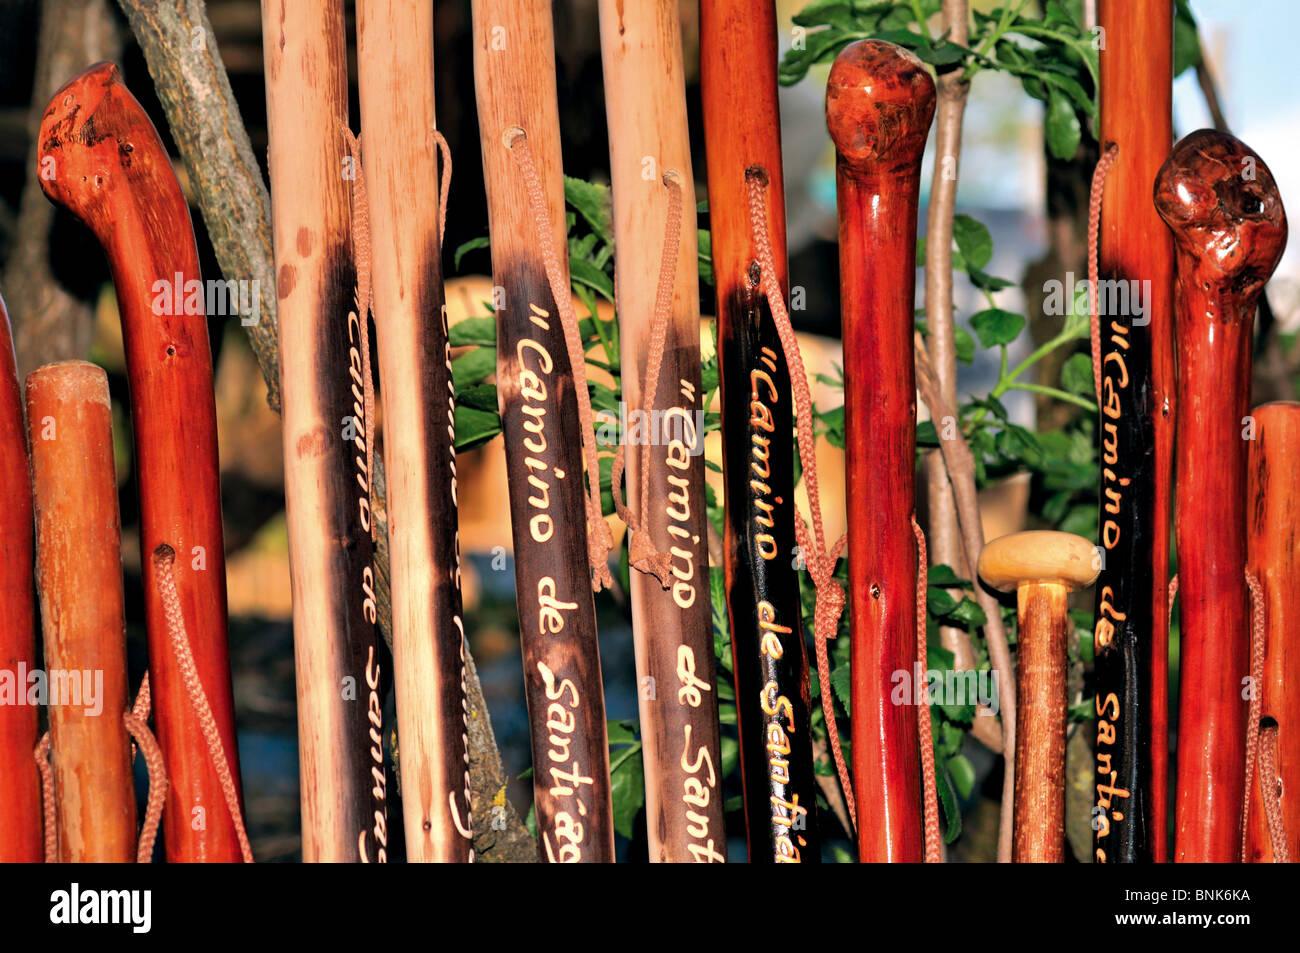 Spain, St. James Way: Walking sticks for St. James Pilgrims - Stock Image